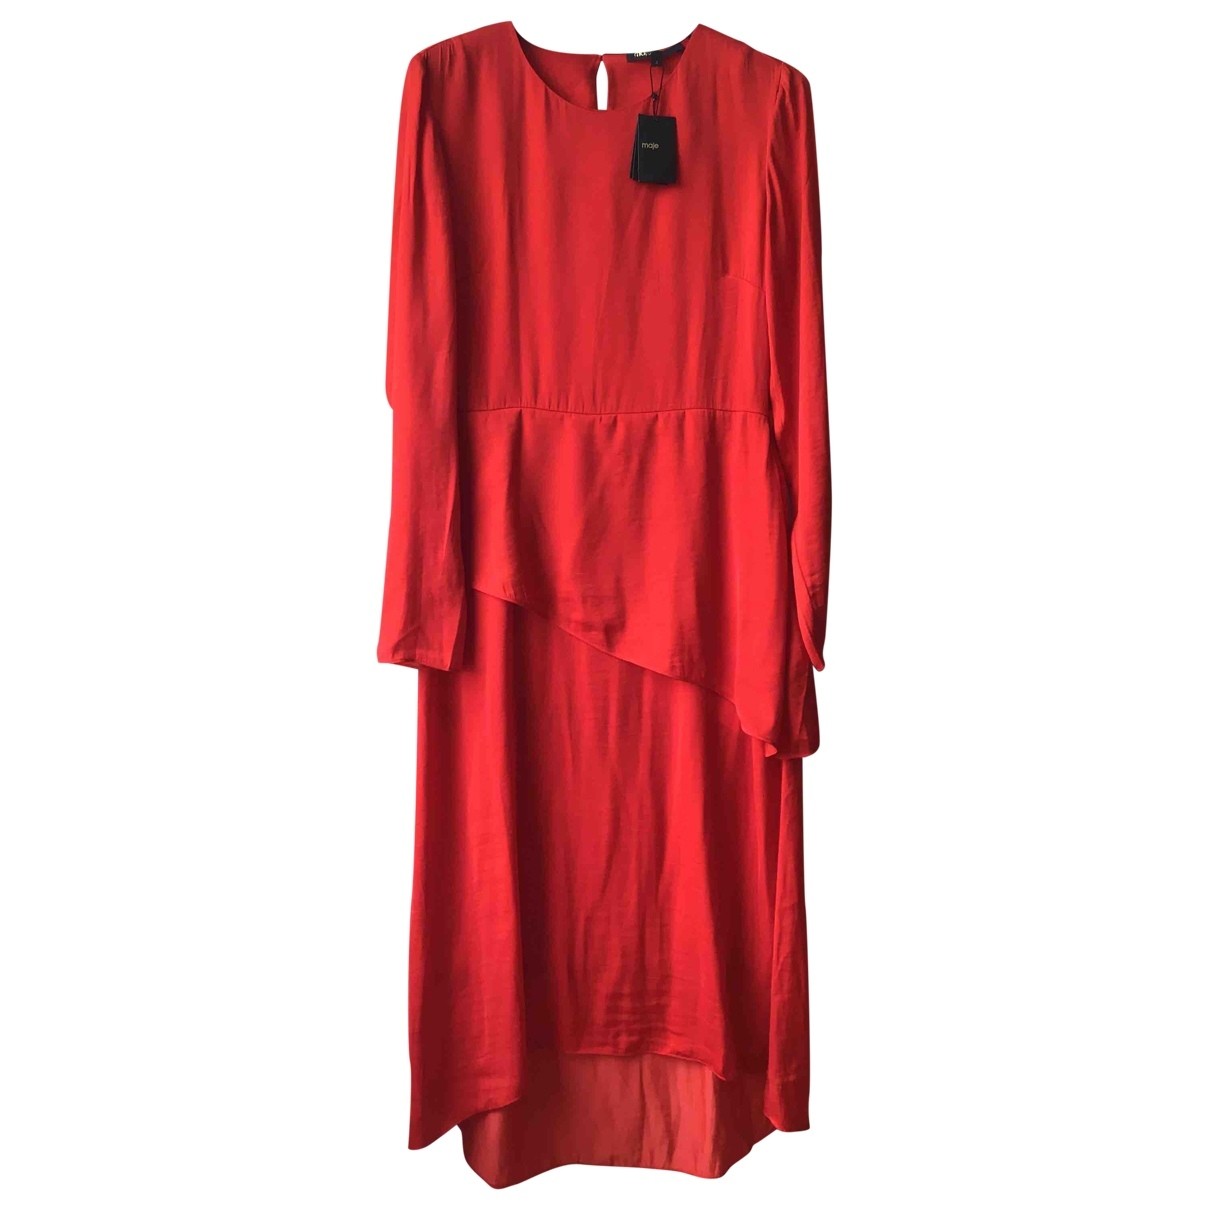 Maje Spring Summer 2019 Red dress for Women 38 FR